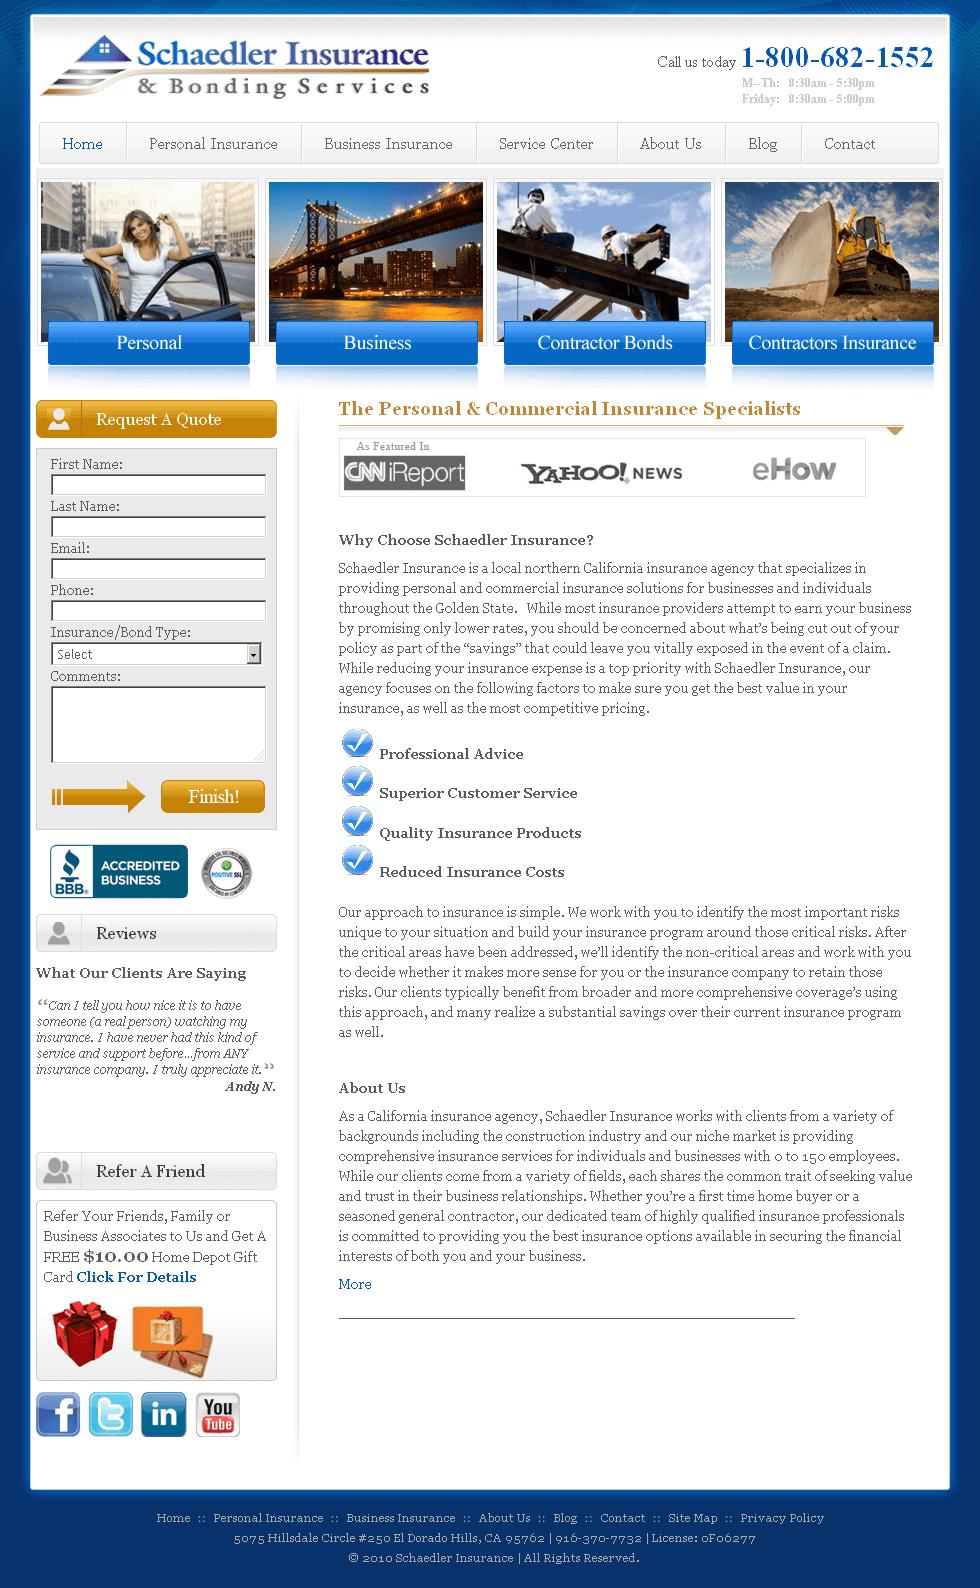 A Website of an Insurance Agency